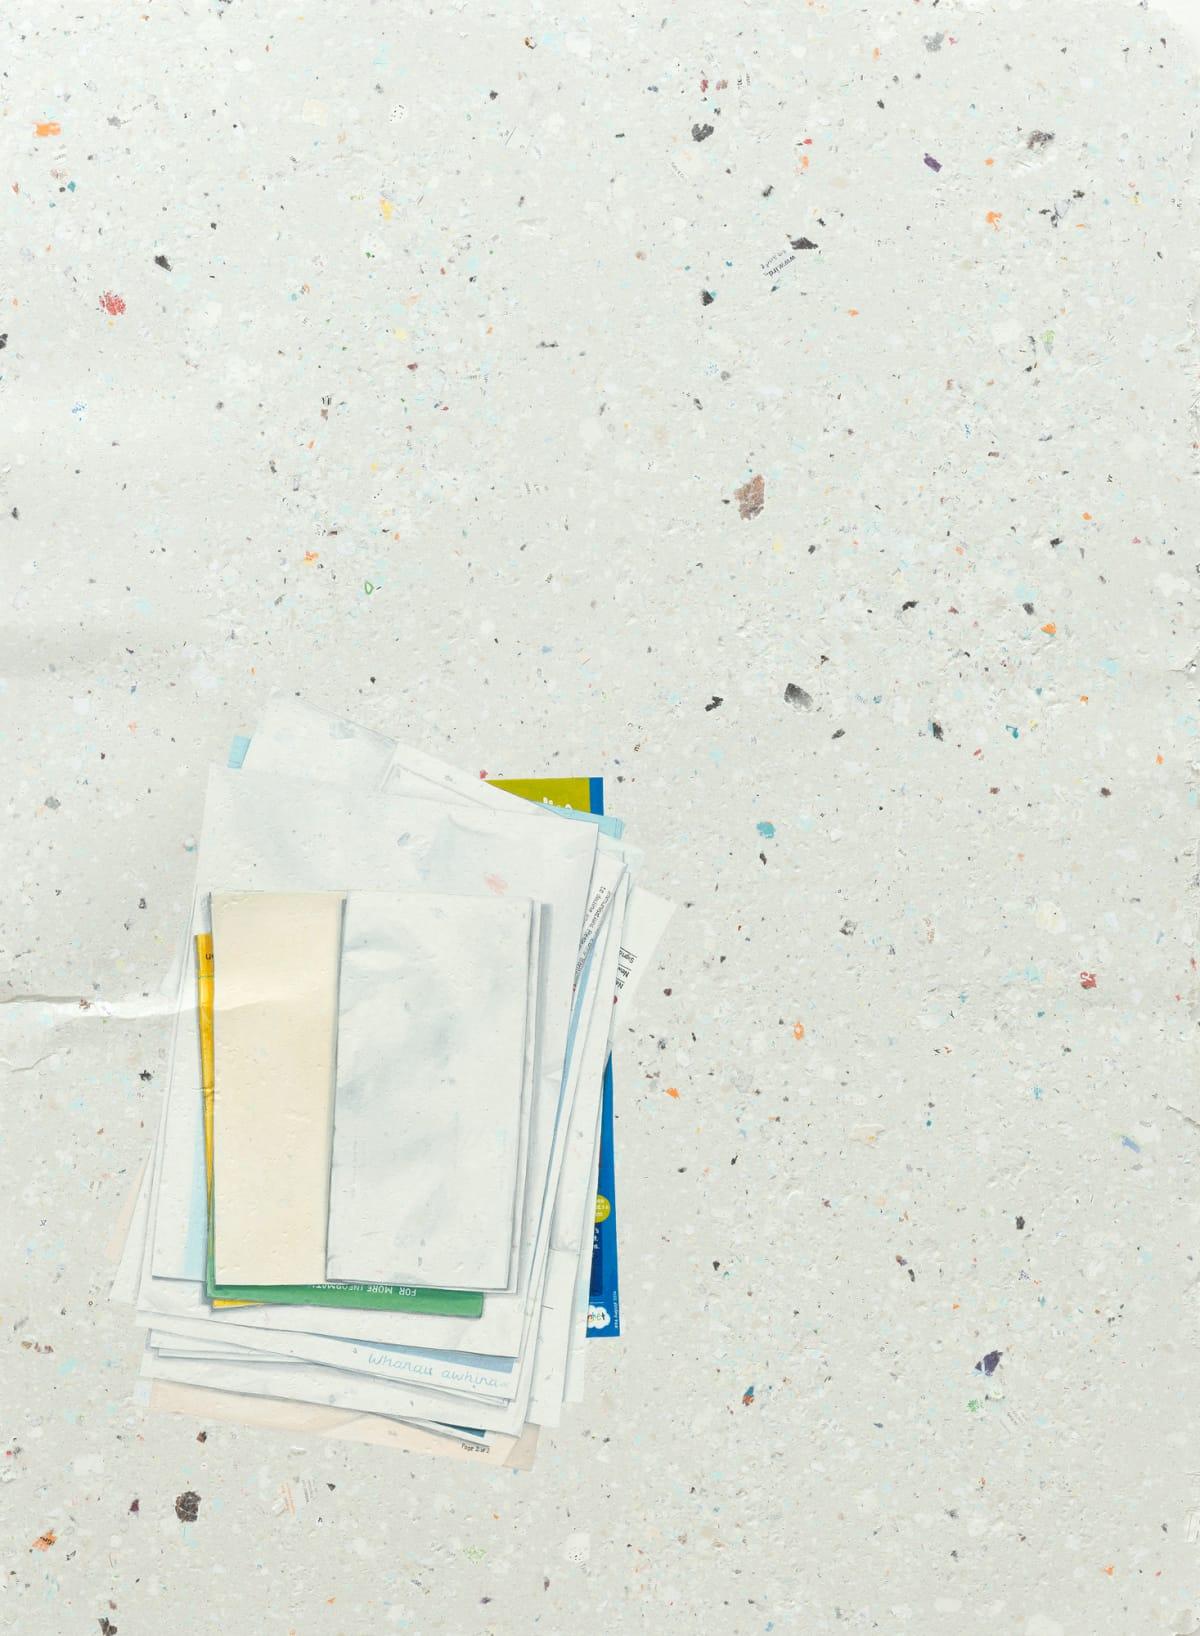 Marita Hewitt  Of Itself (Advice, Advise), 2017  Watercolour  36.8 x 26 in 93.5 x 66 cm